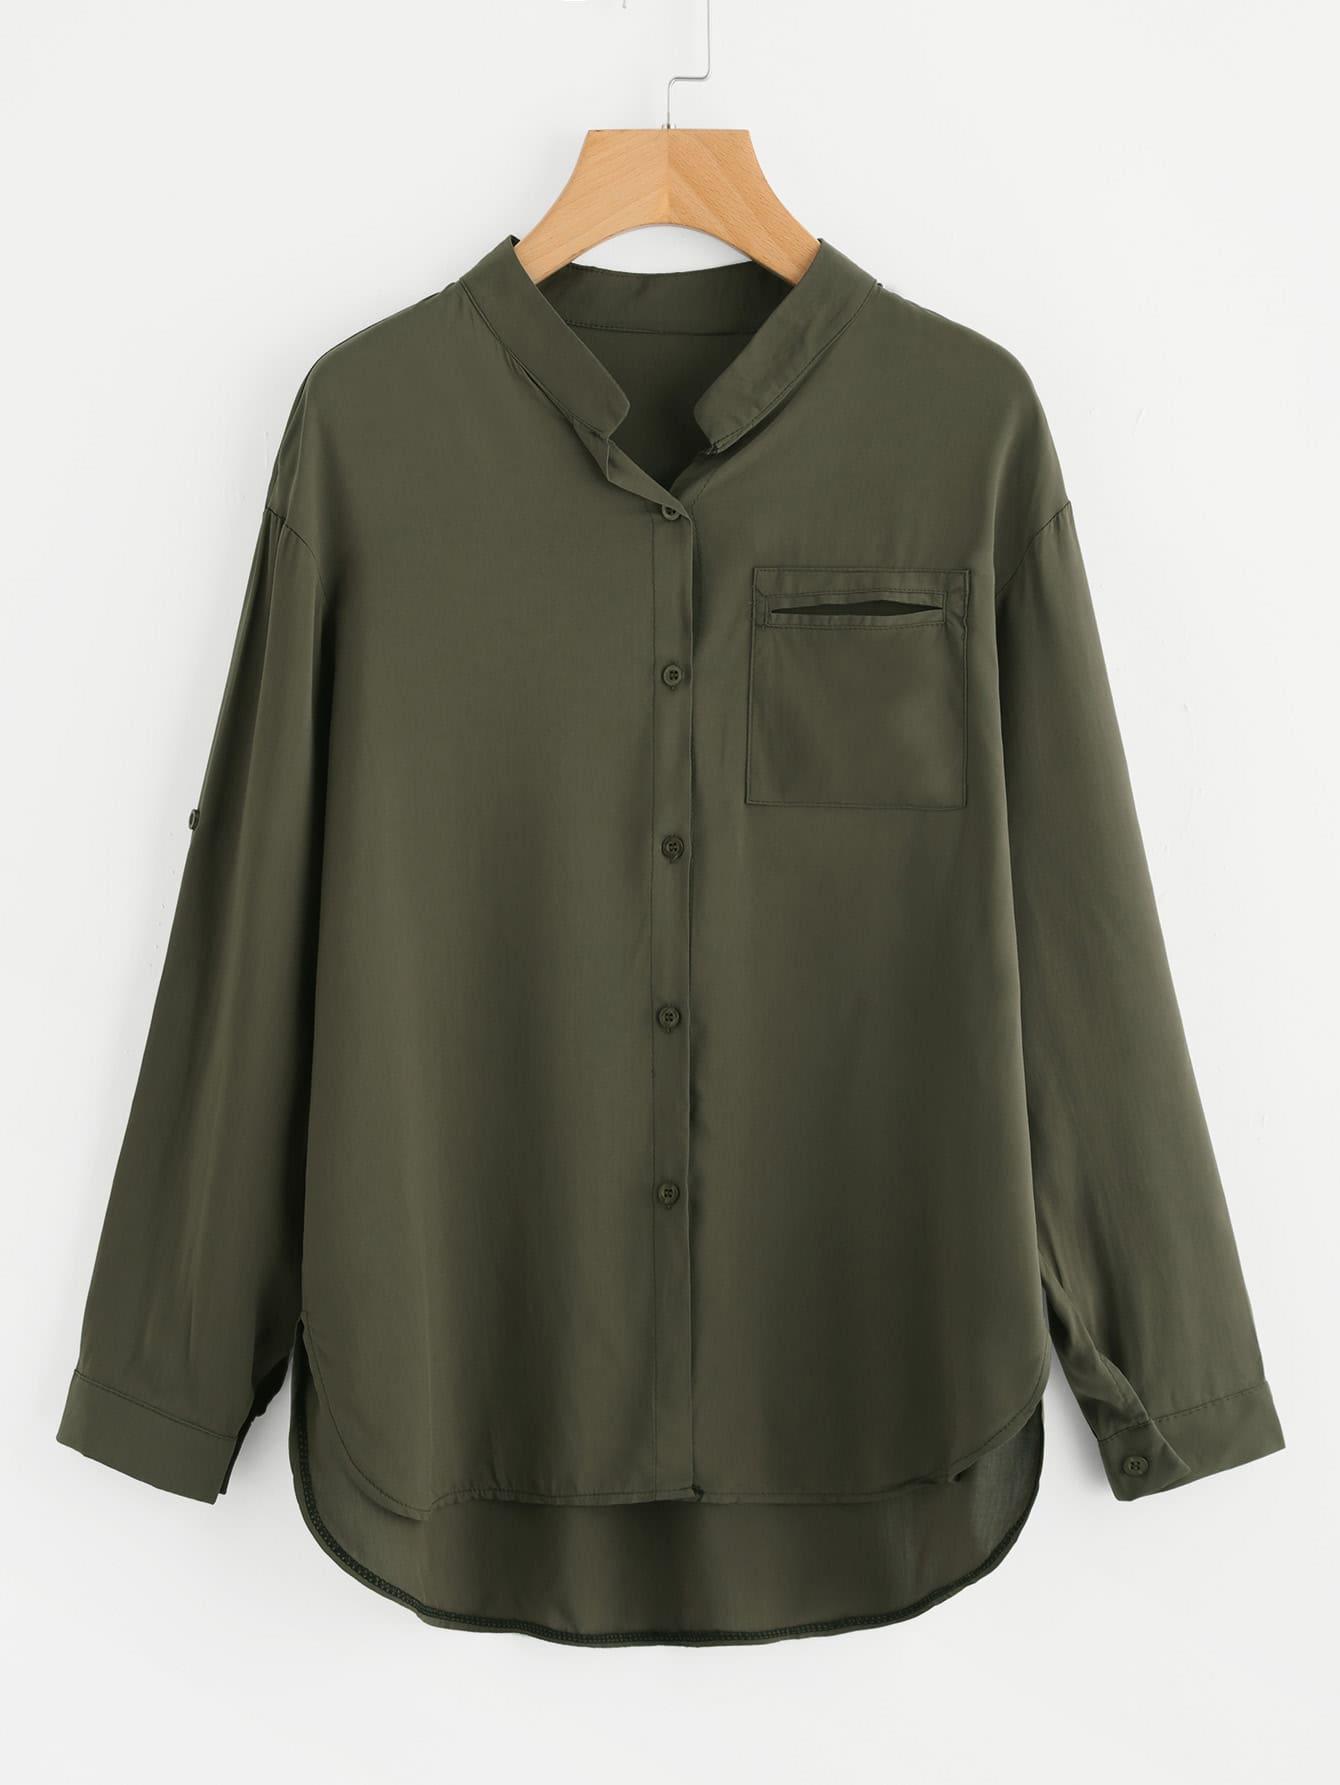 Roll Tab Sleeve High Low Shirt stoosh new salmon juniors roll tab sleeve plaid shirt s $34 dbfl